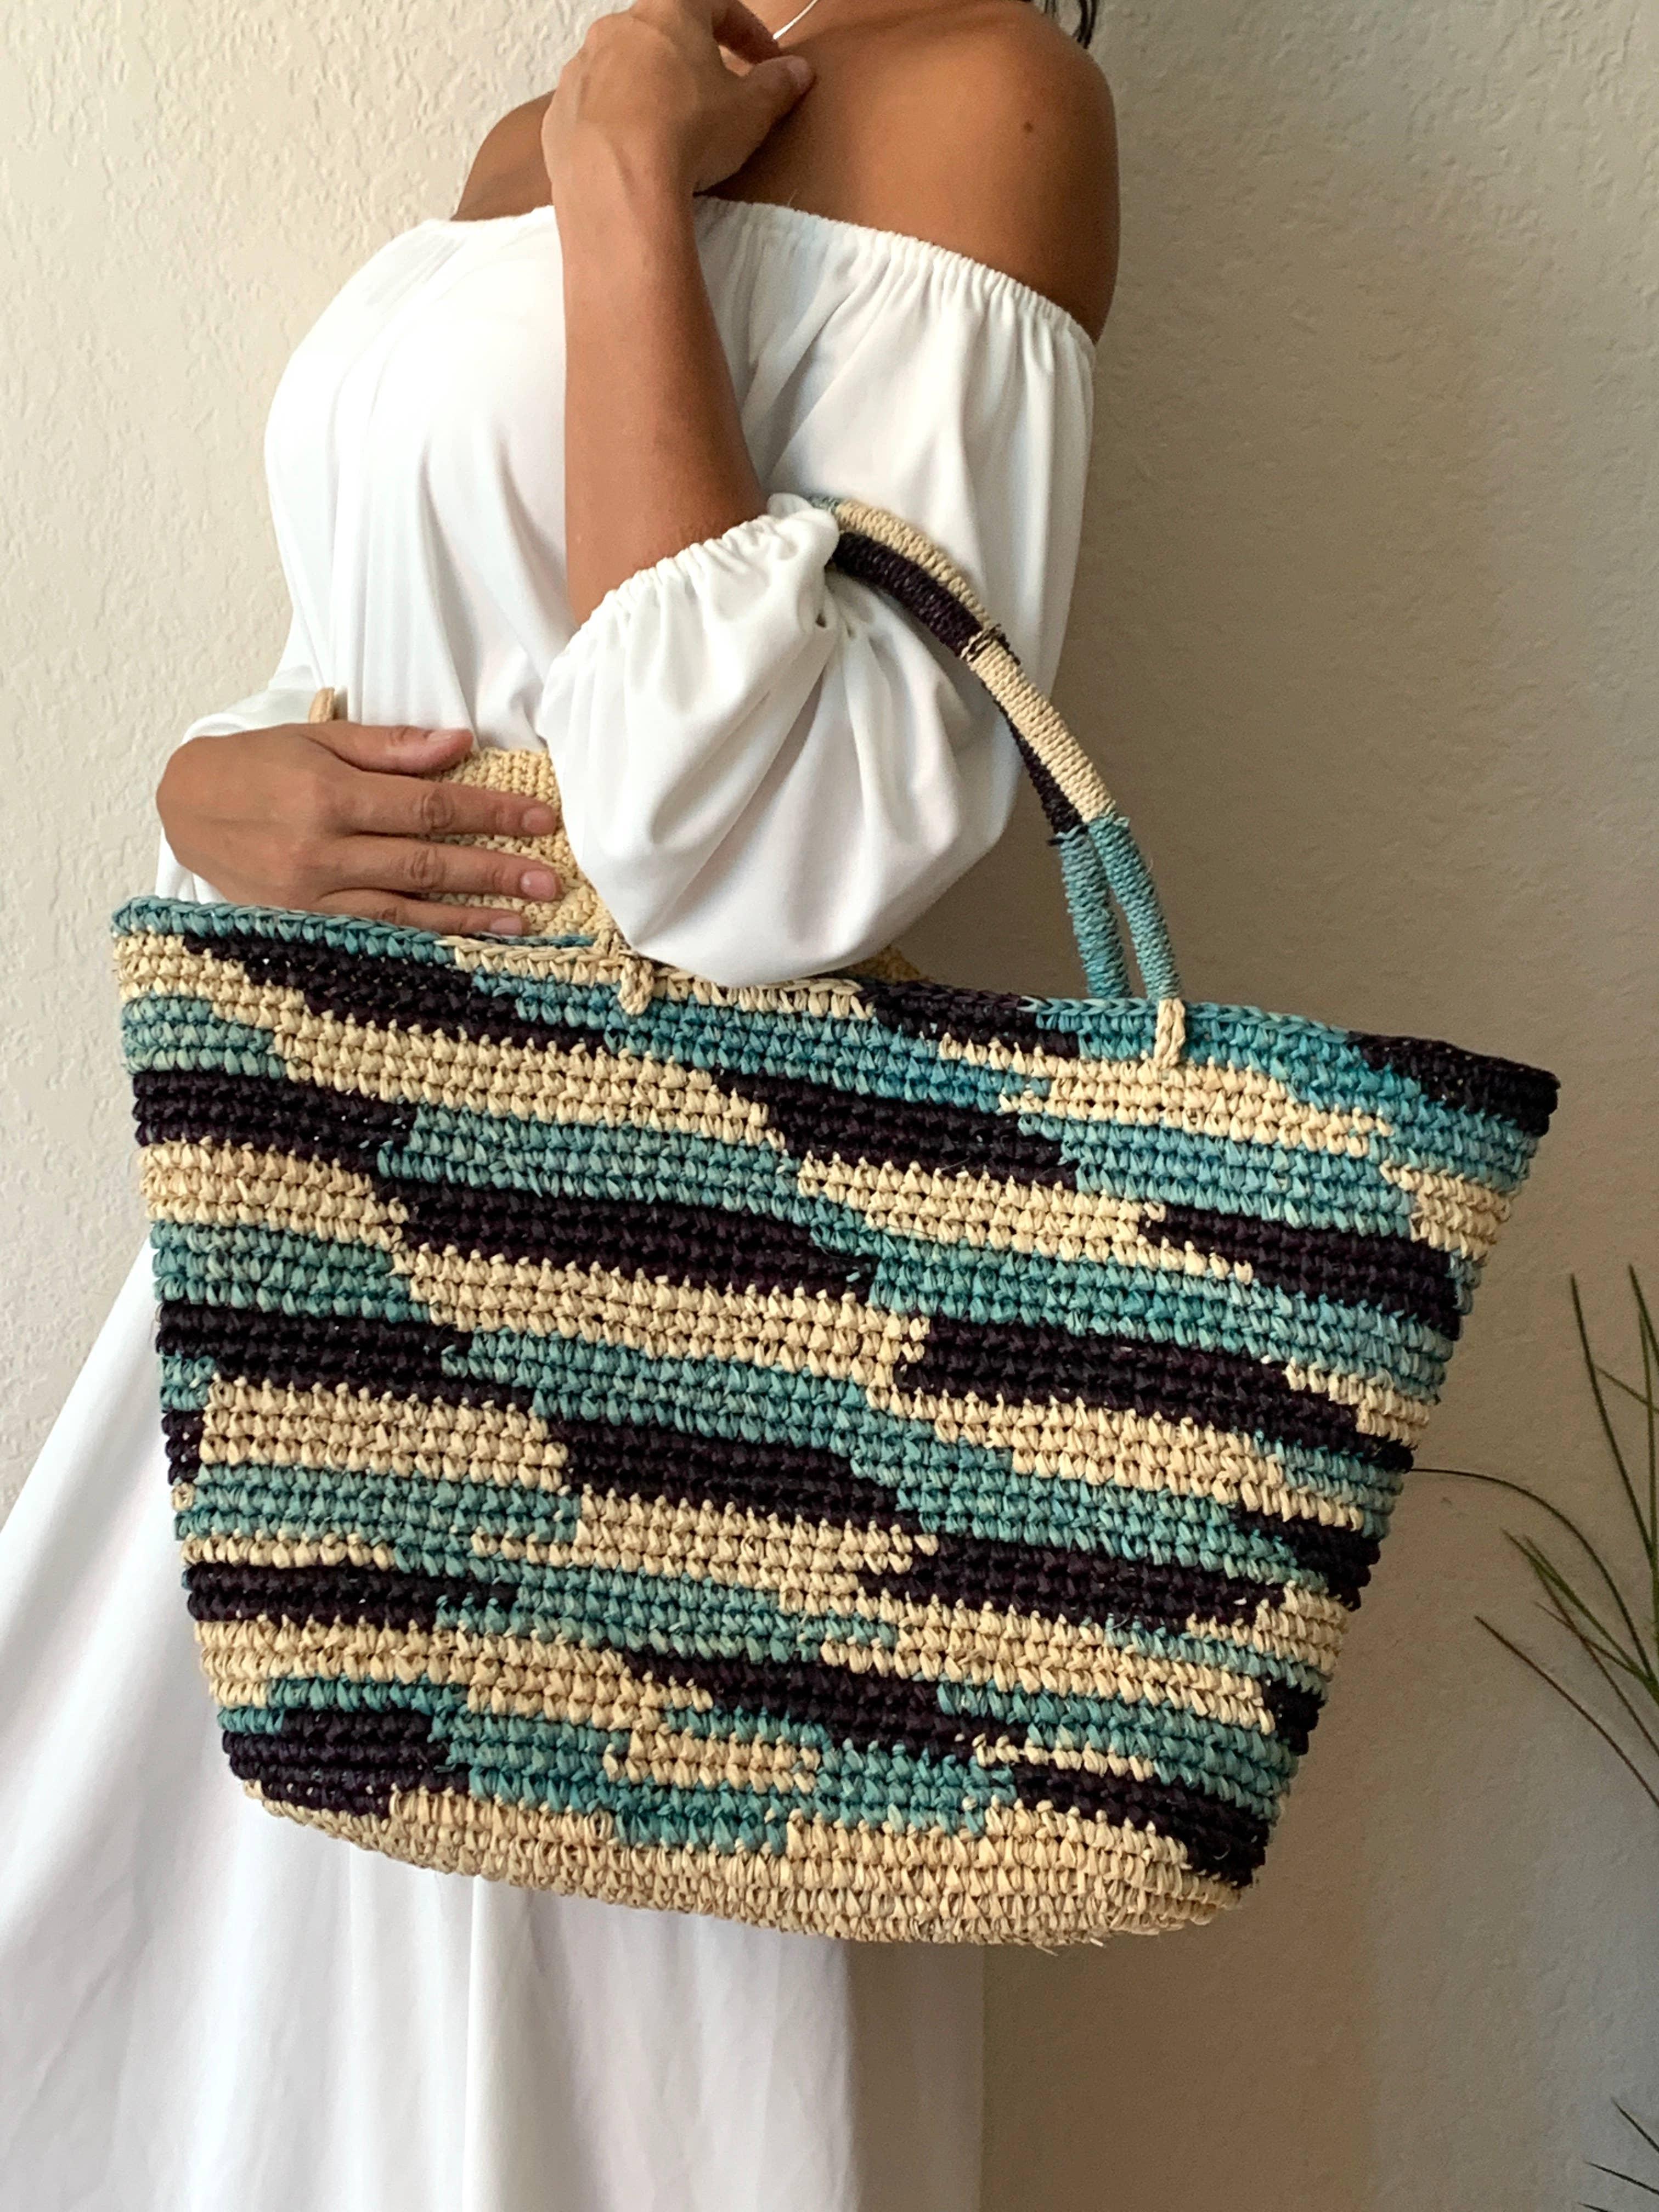 Lemloreli - Crochet Multi Color Tote | Trada Marketplace